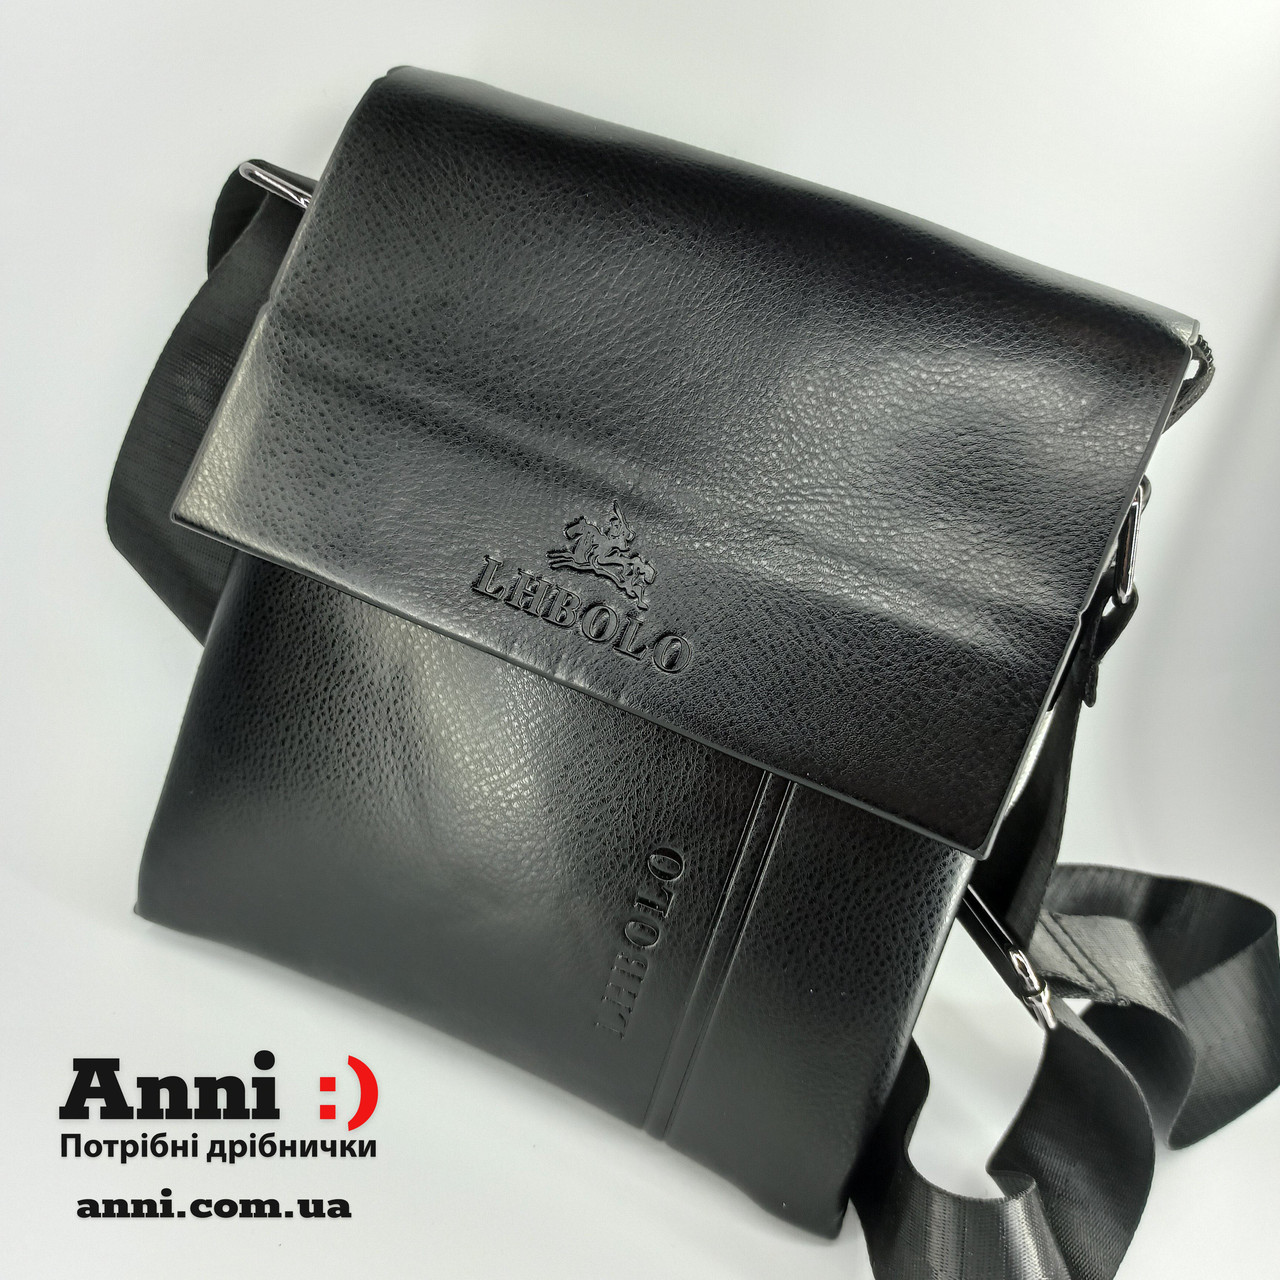 Чоловіча сумка планшет через плече з еко шкіри 23*20